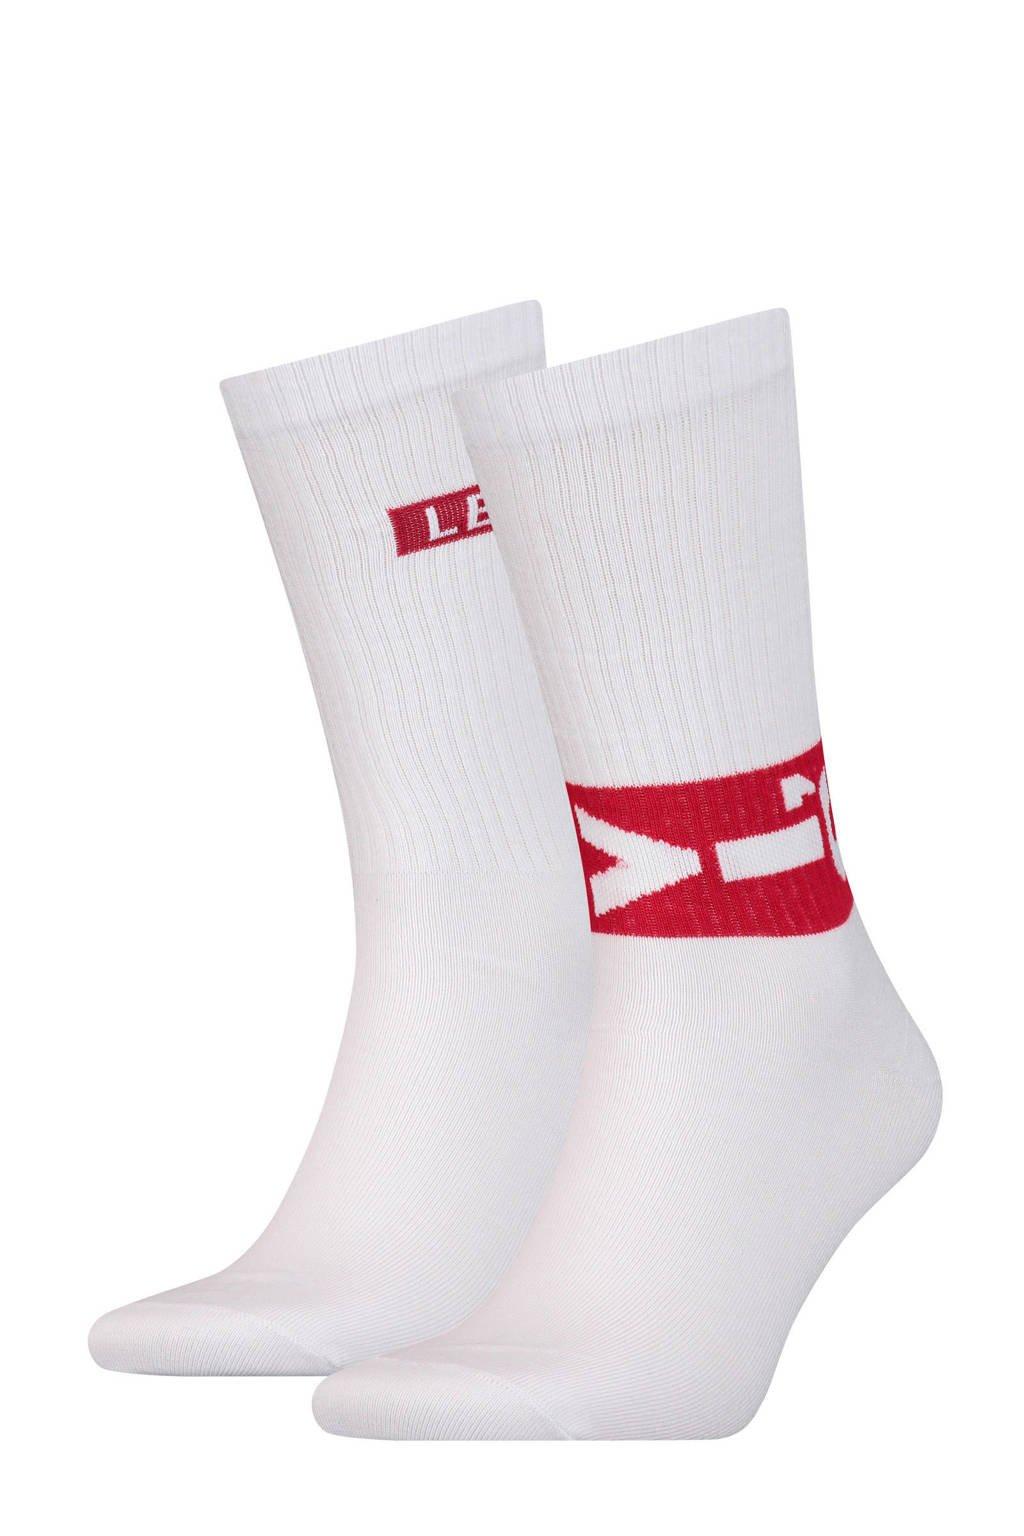 Levi's sokken met logo wit, Wit/rood